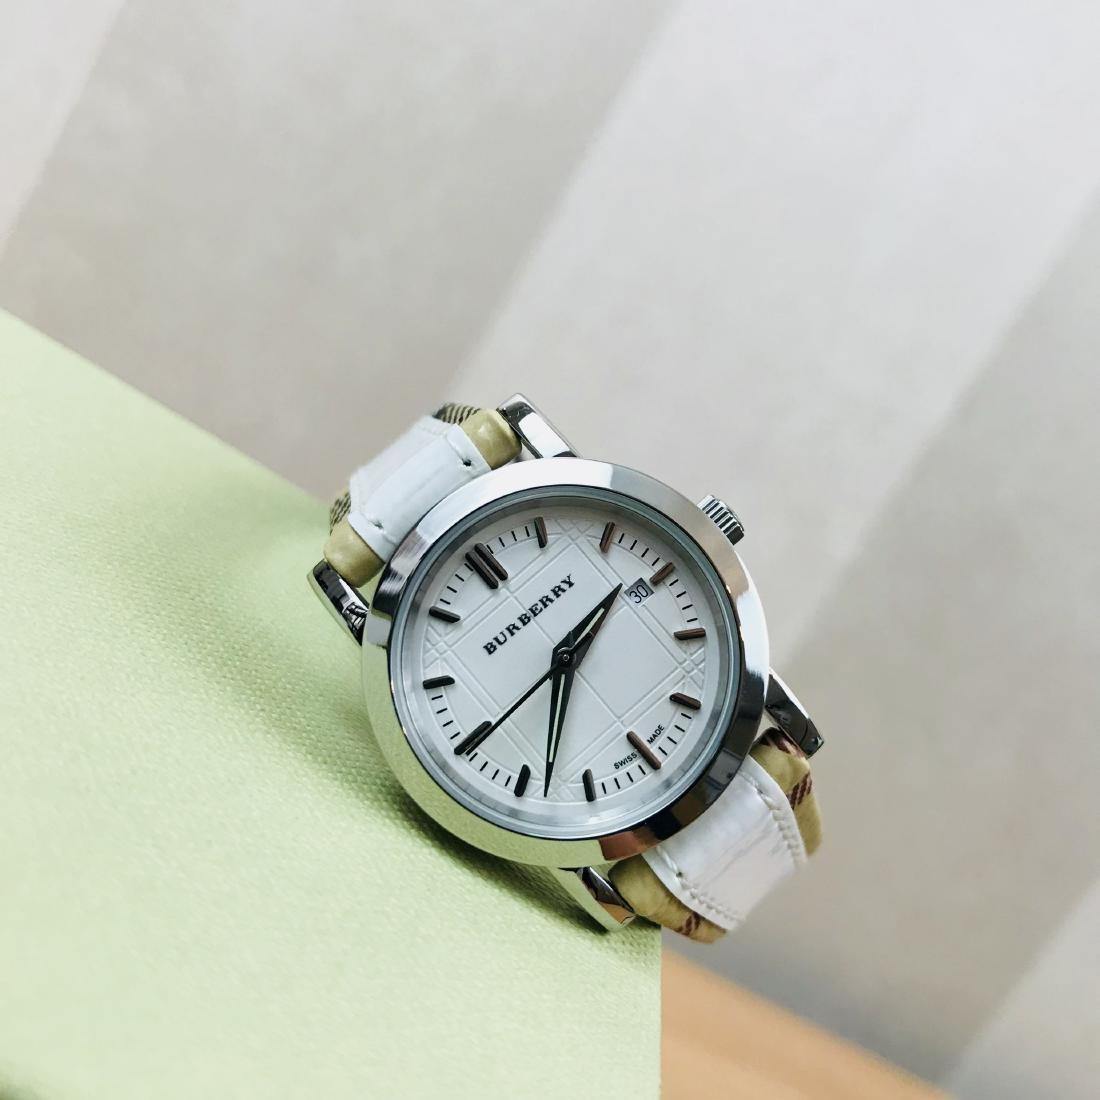 Burberry Swiss Made Classic Ladies Watch - 3